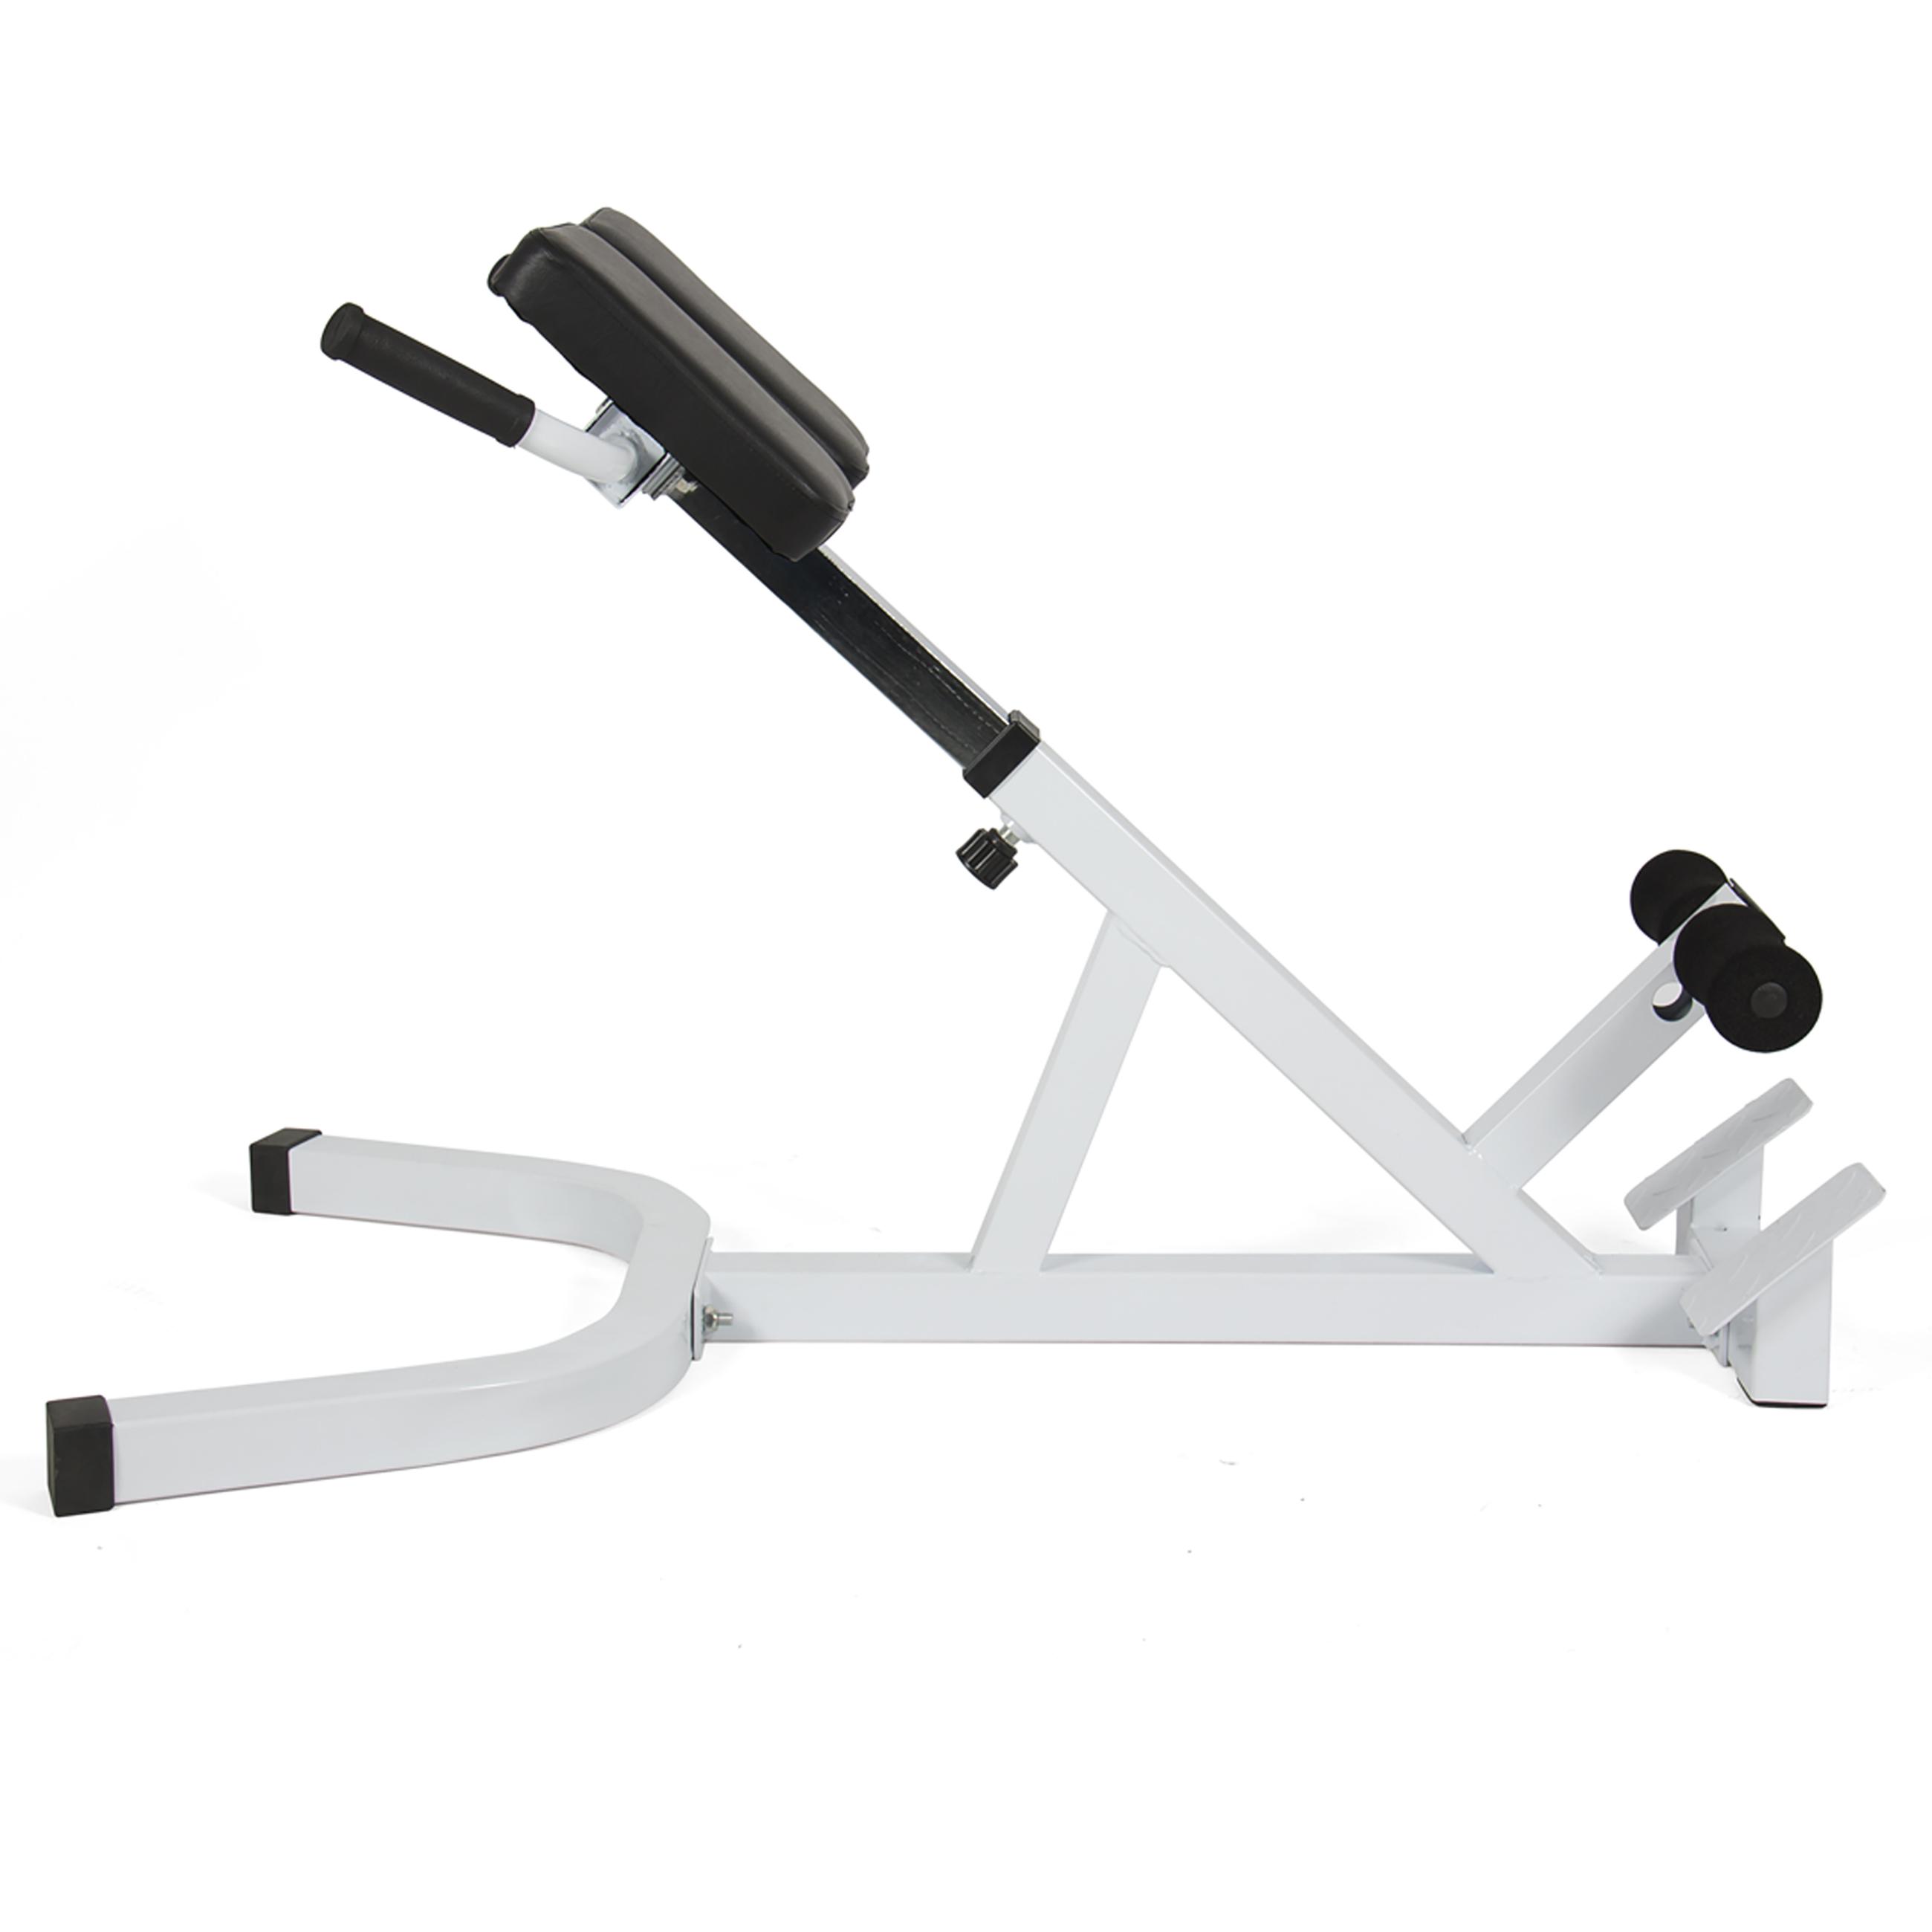 Ab Bench Roman Chair 45 Degree Hyperextension Abdominal Bench Gym